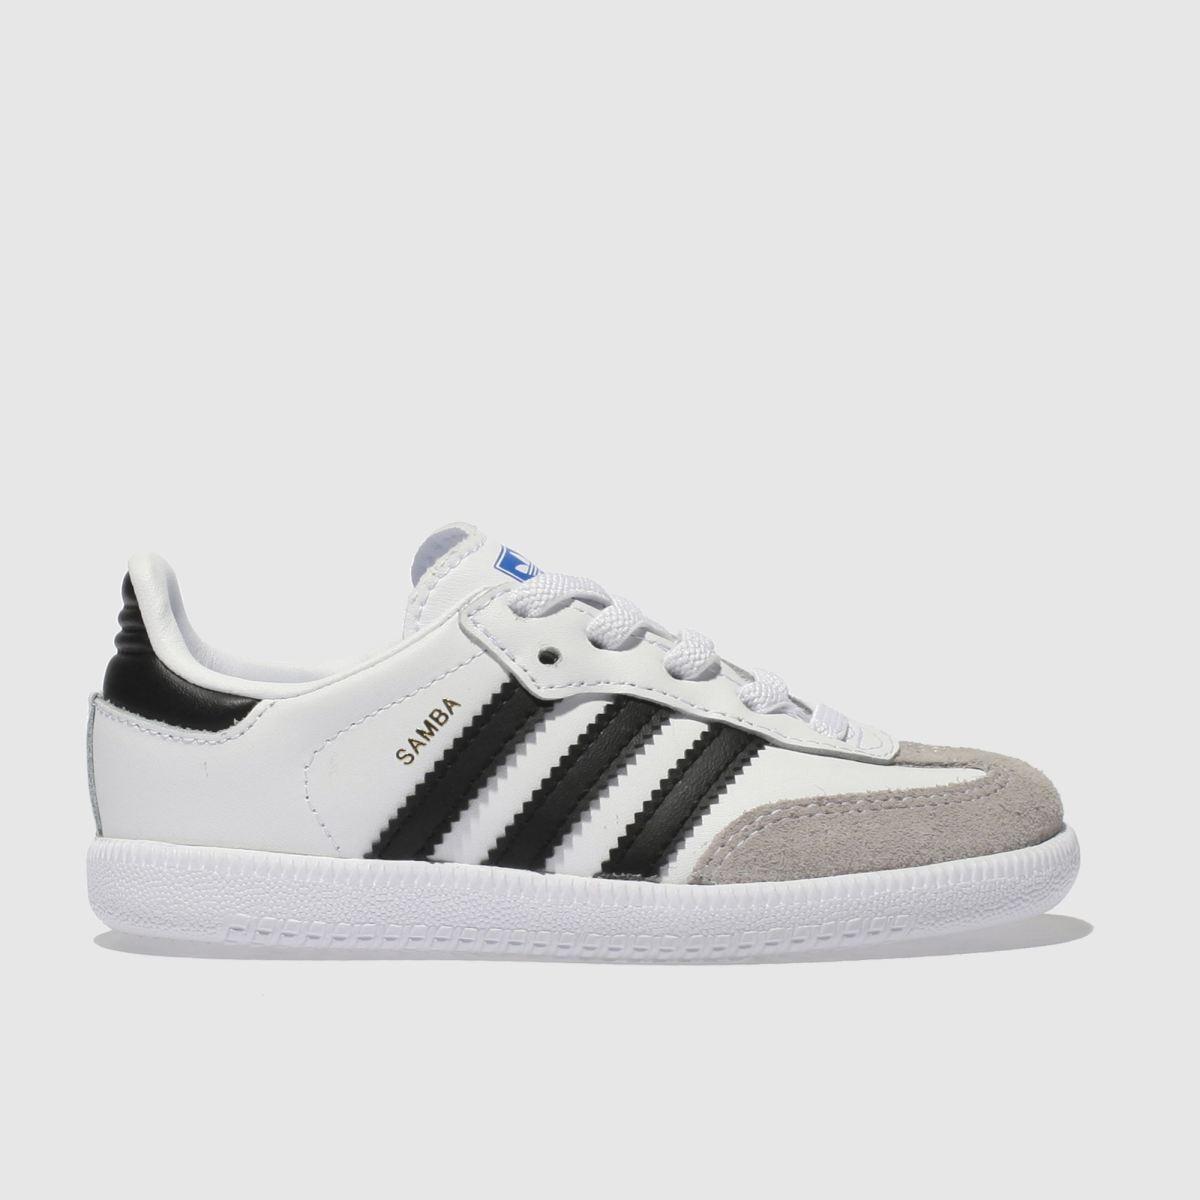 Adidas White & Black Samba Og El Unisex Toddler Toddler